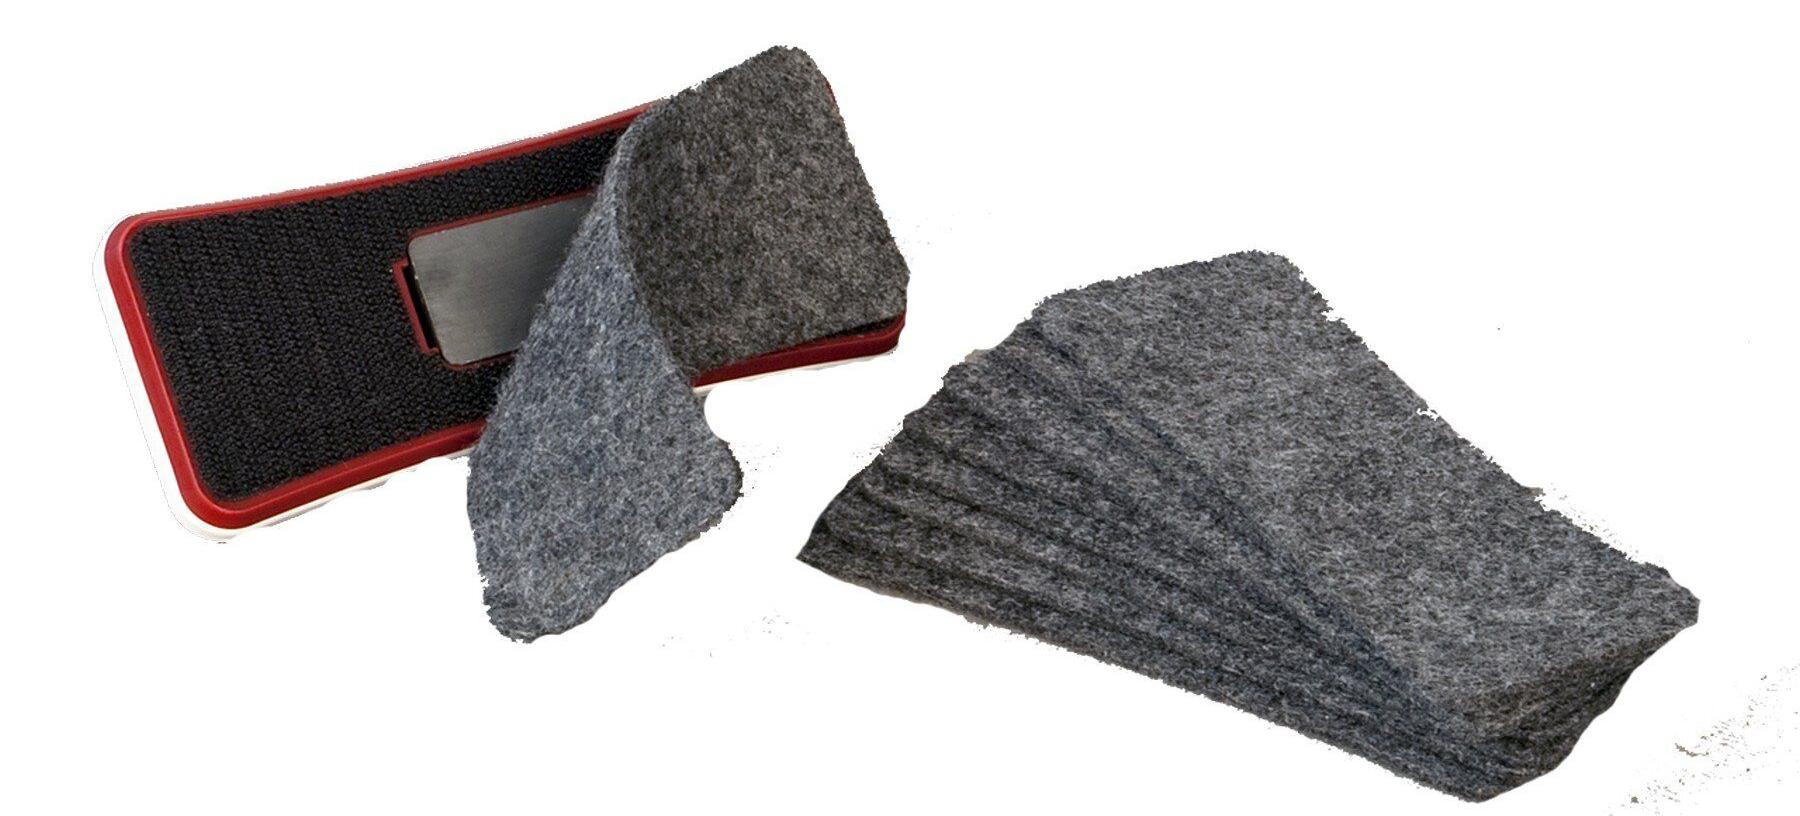 Губка для доски на магните Slim, войлочные вкладыши 2x3 - фото 5